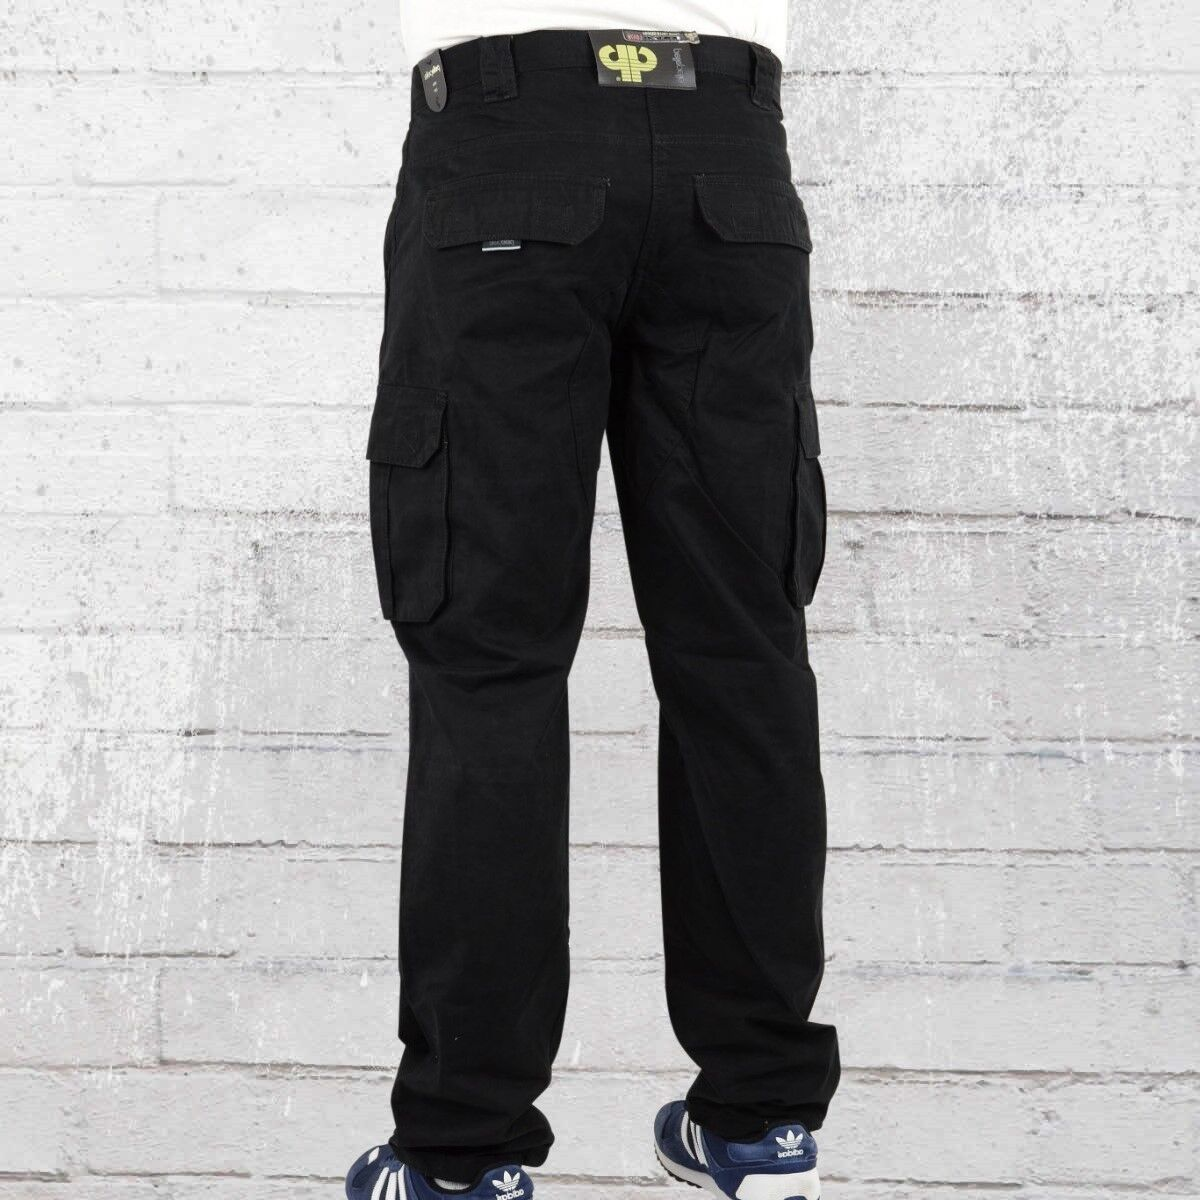 Pelle Pelle Pelle Pelle Basic Re-Up Cargo Hose schwarz Cargohose Herren Männer Men's Pants 4a4052